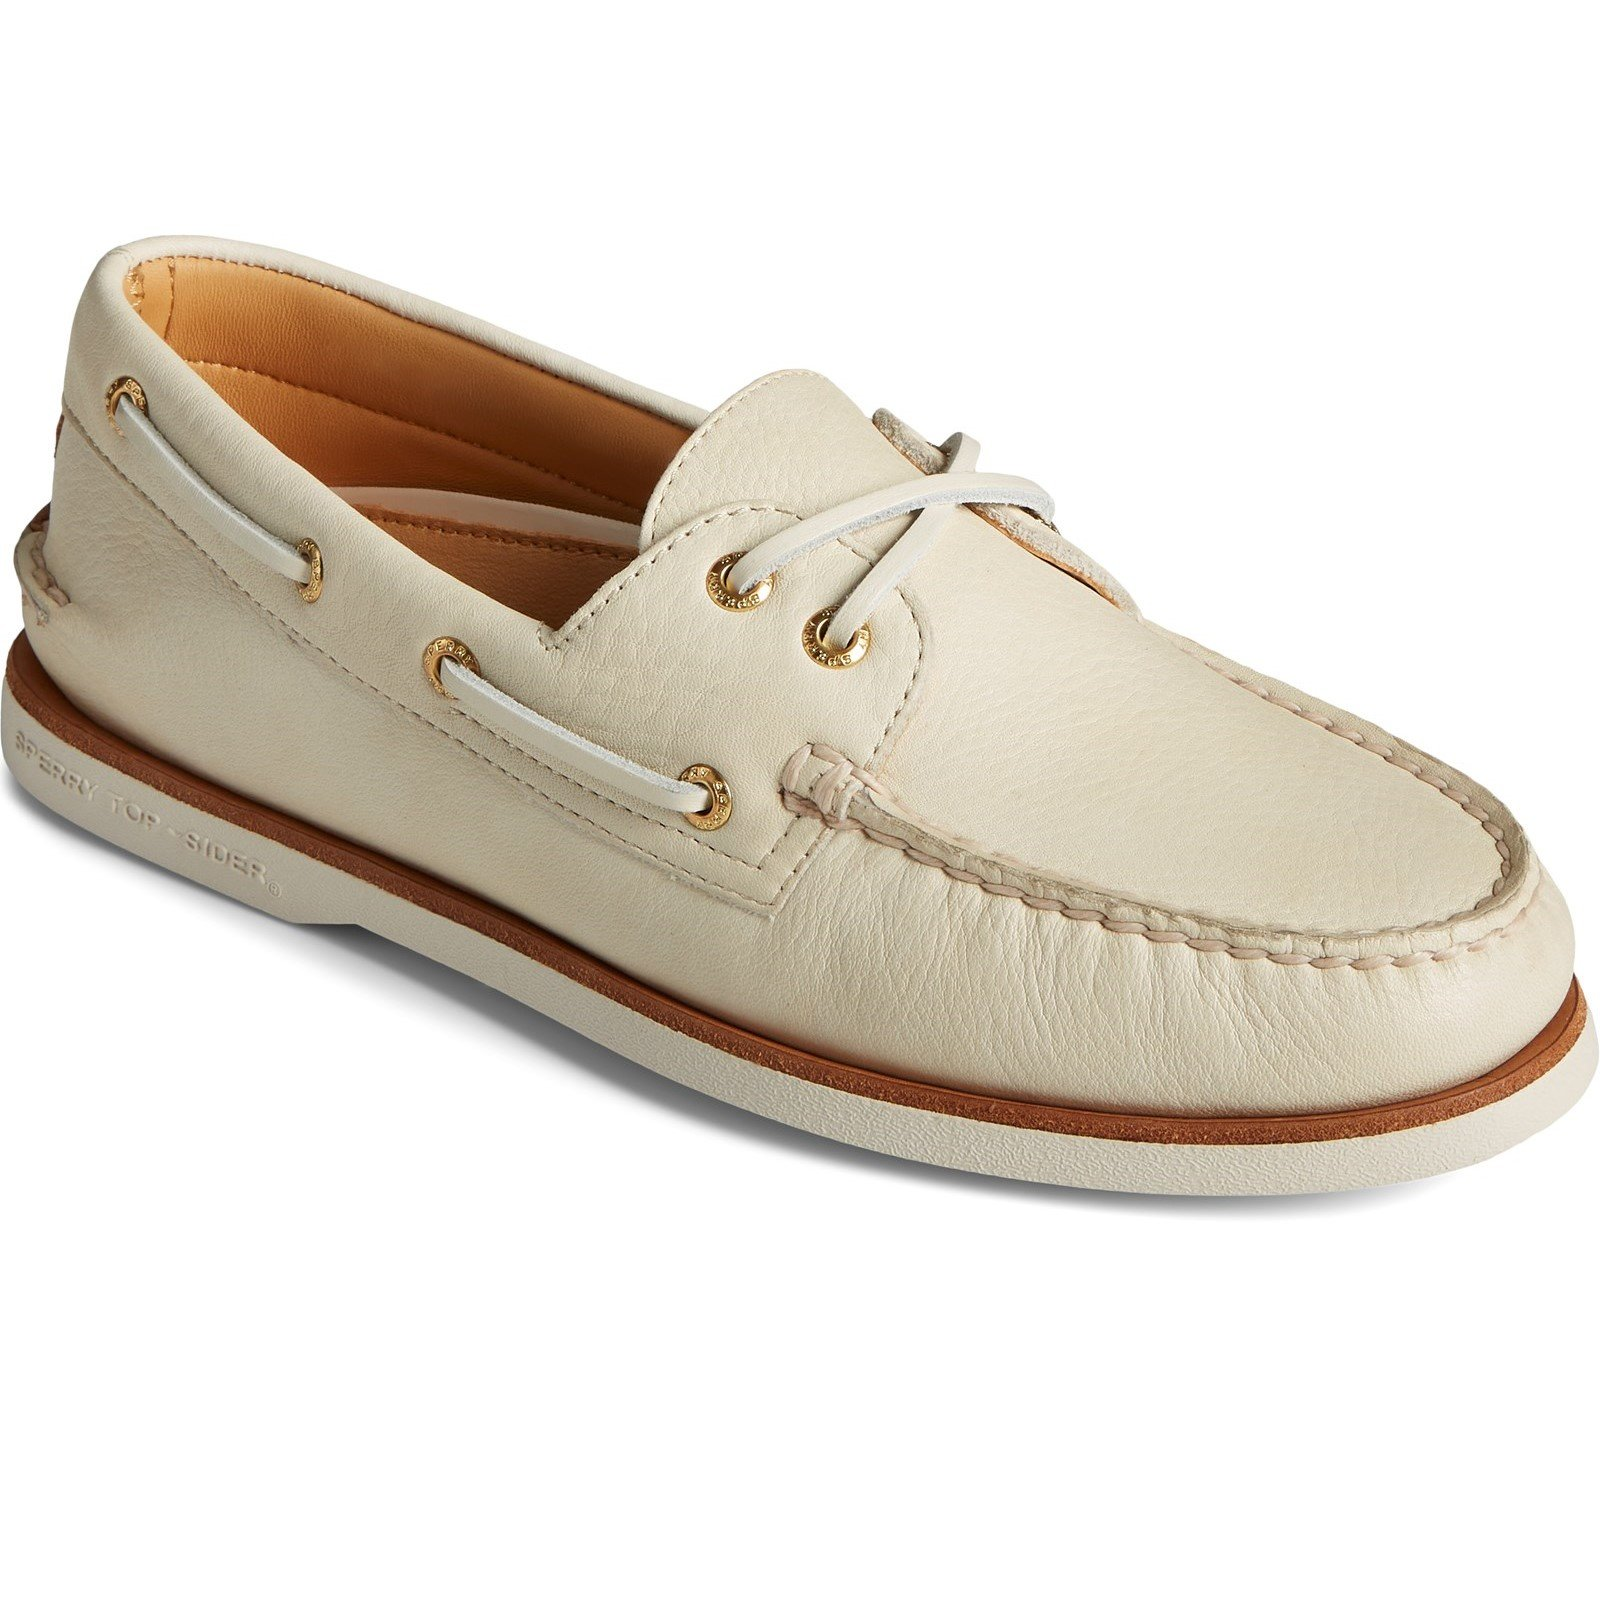 Sperry Men's A/O 2-Eye Boat Shoe Various Colours 32926 - Cream 9